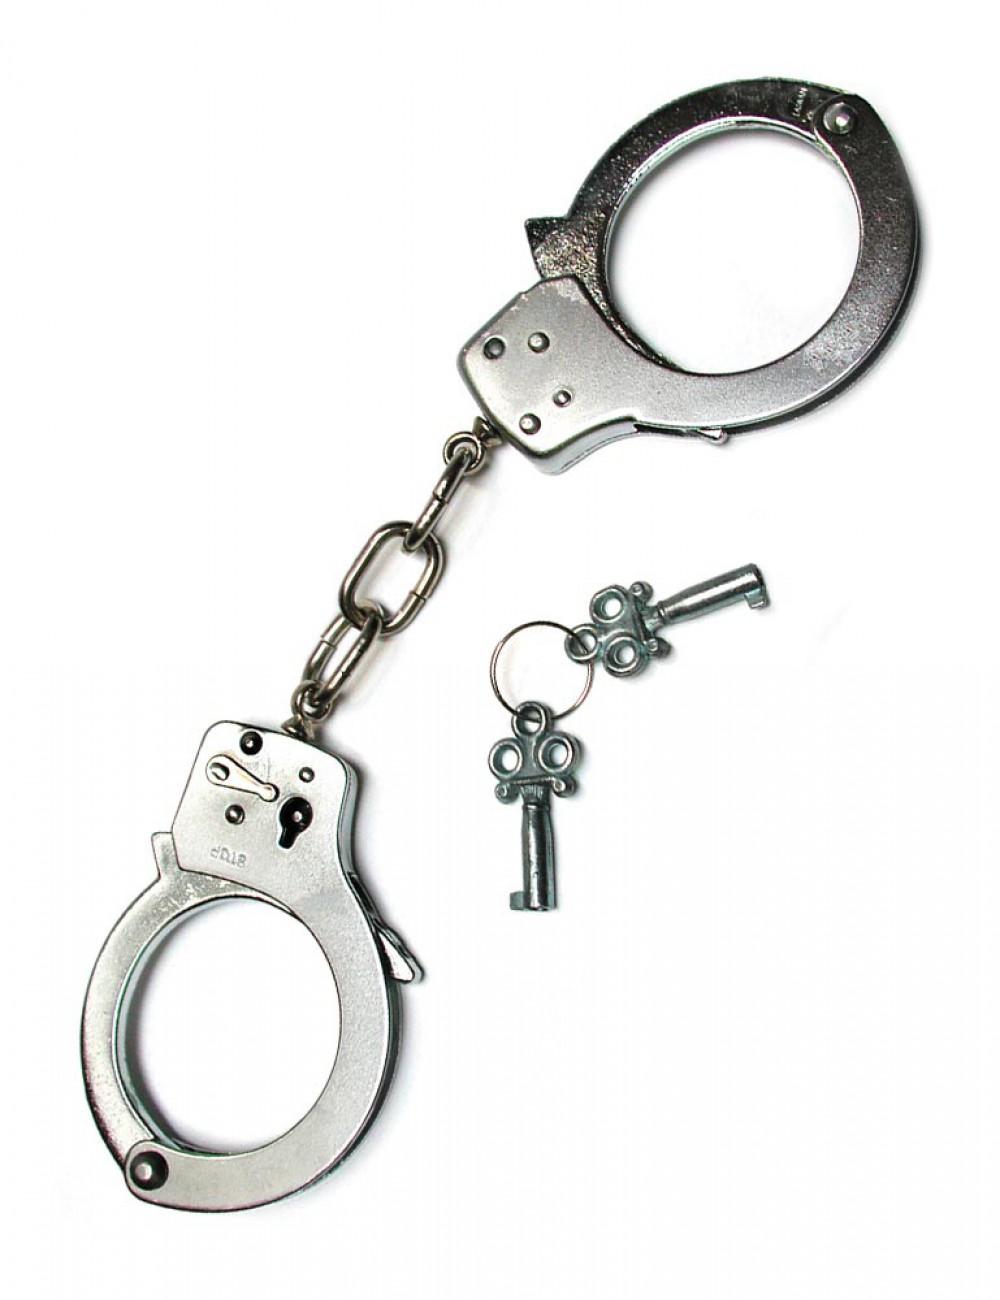 KinkLab Basic Handcuffs